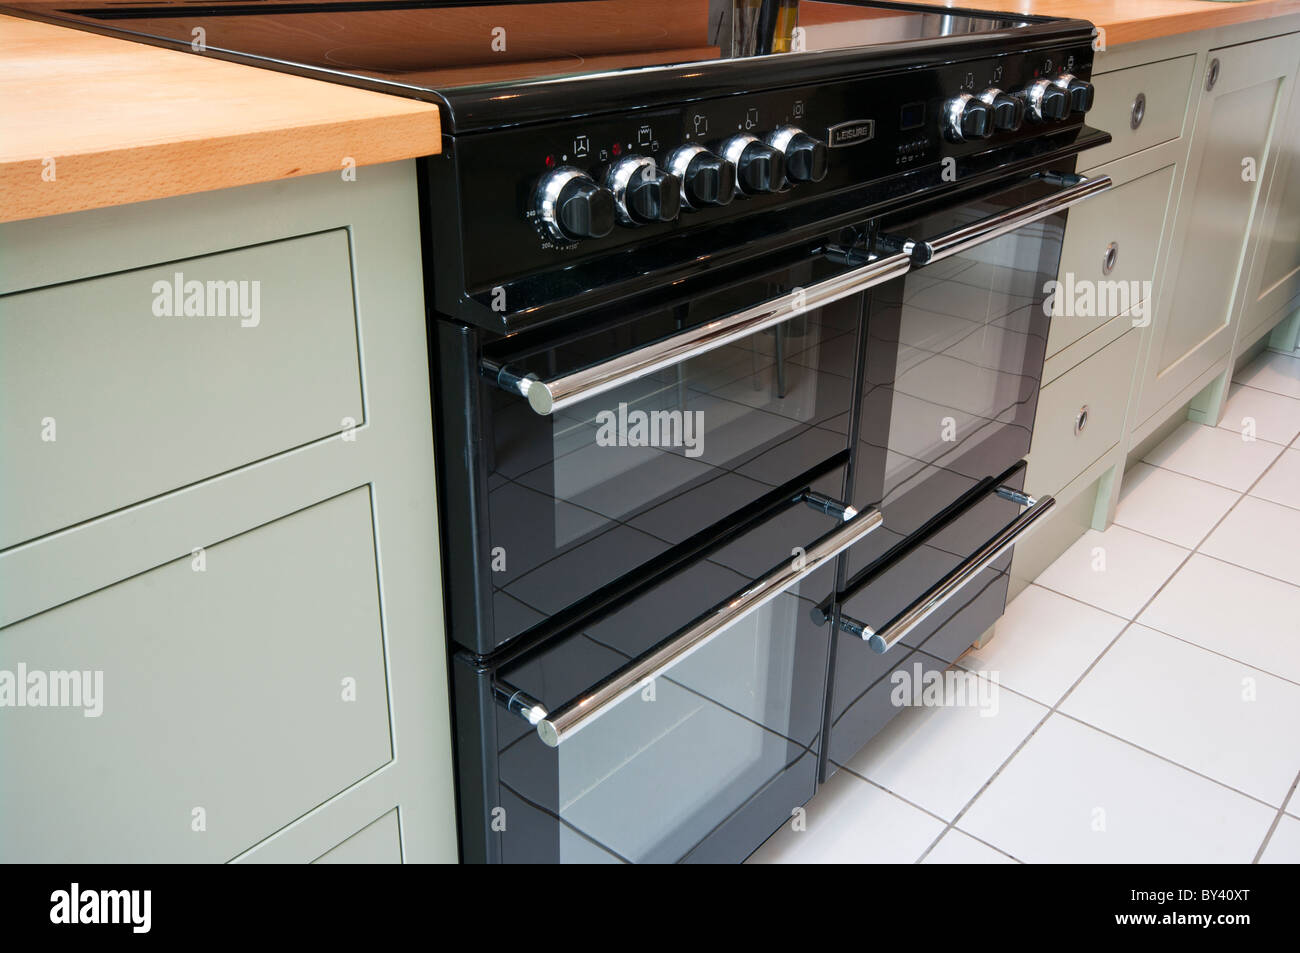 Electric Kitchen Range Cooker - Stock Image